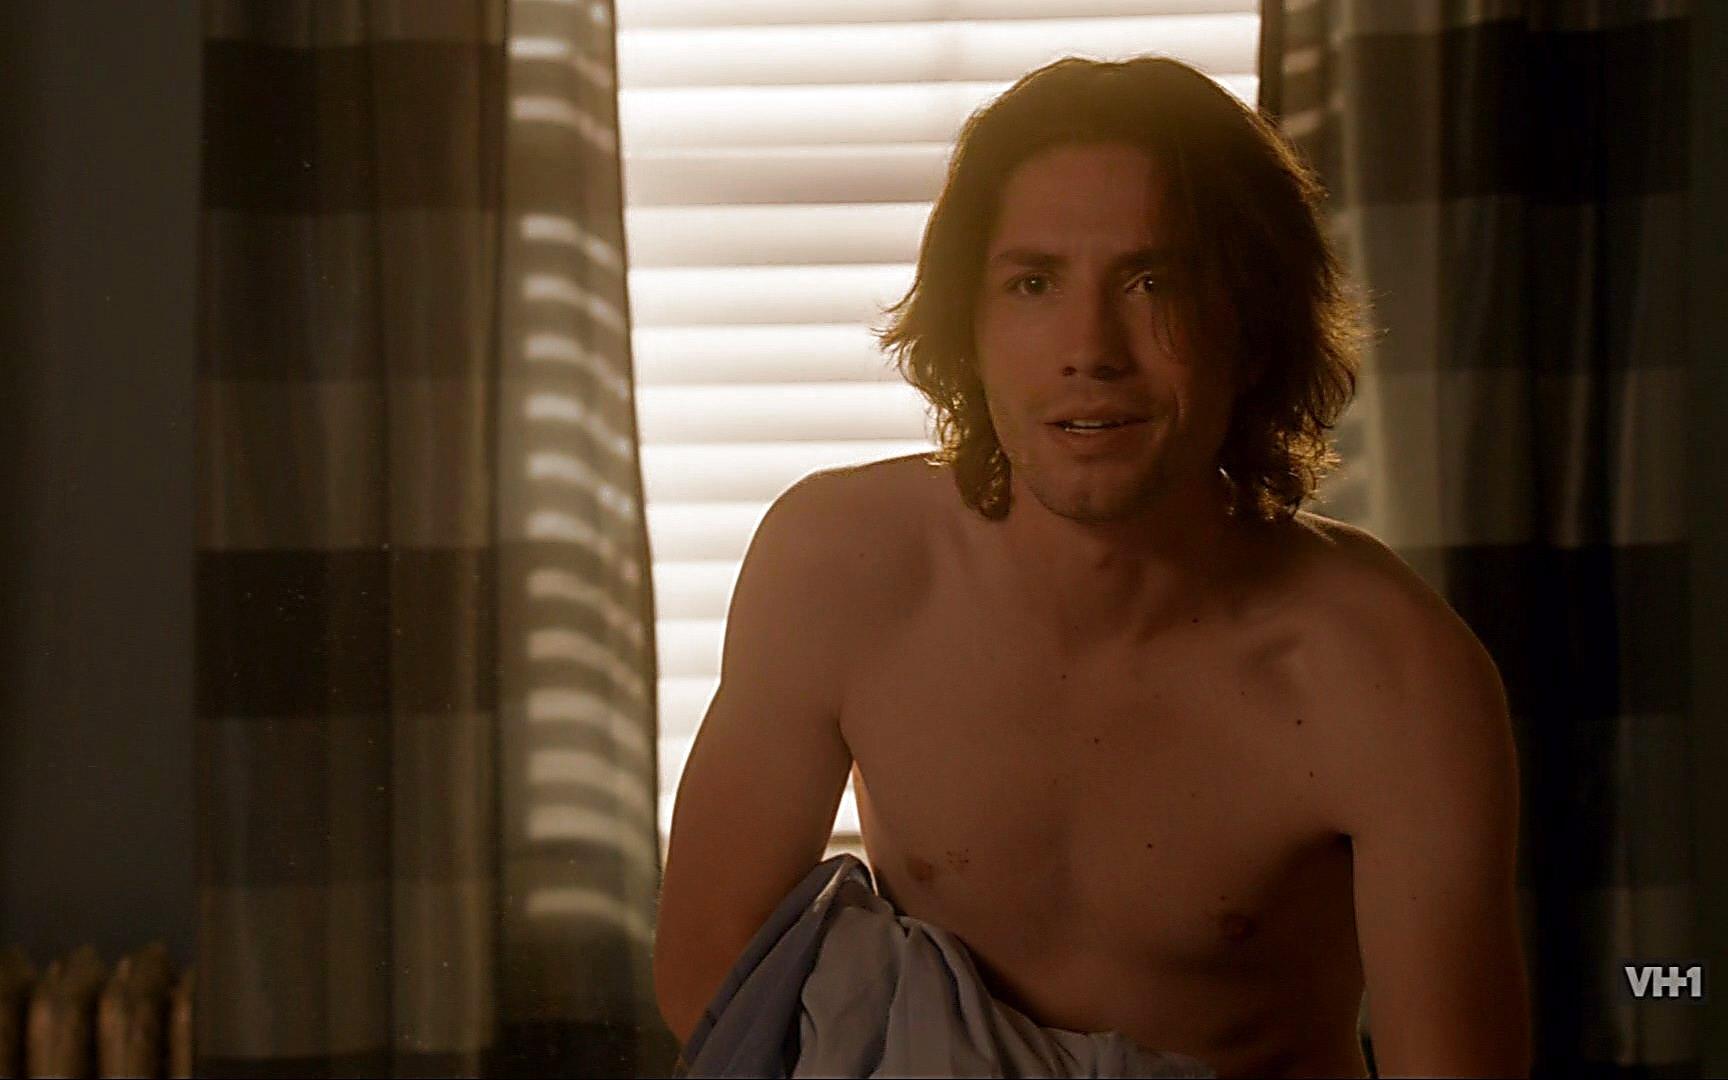 Craig Horner sexy shirtless scene January 3, 2015, 5pm